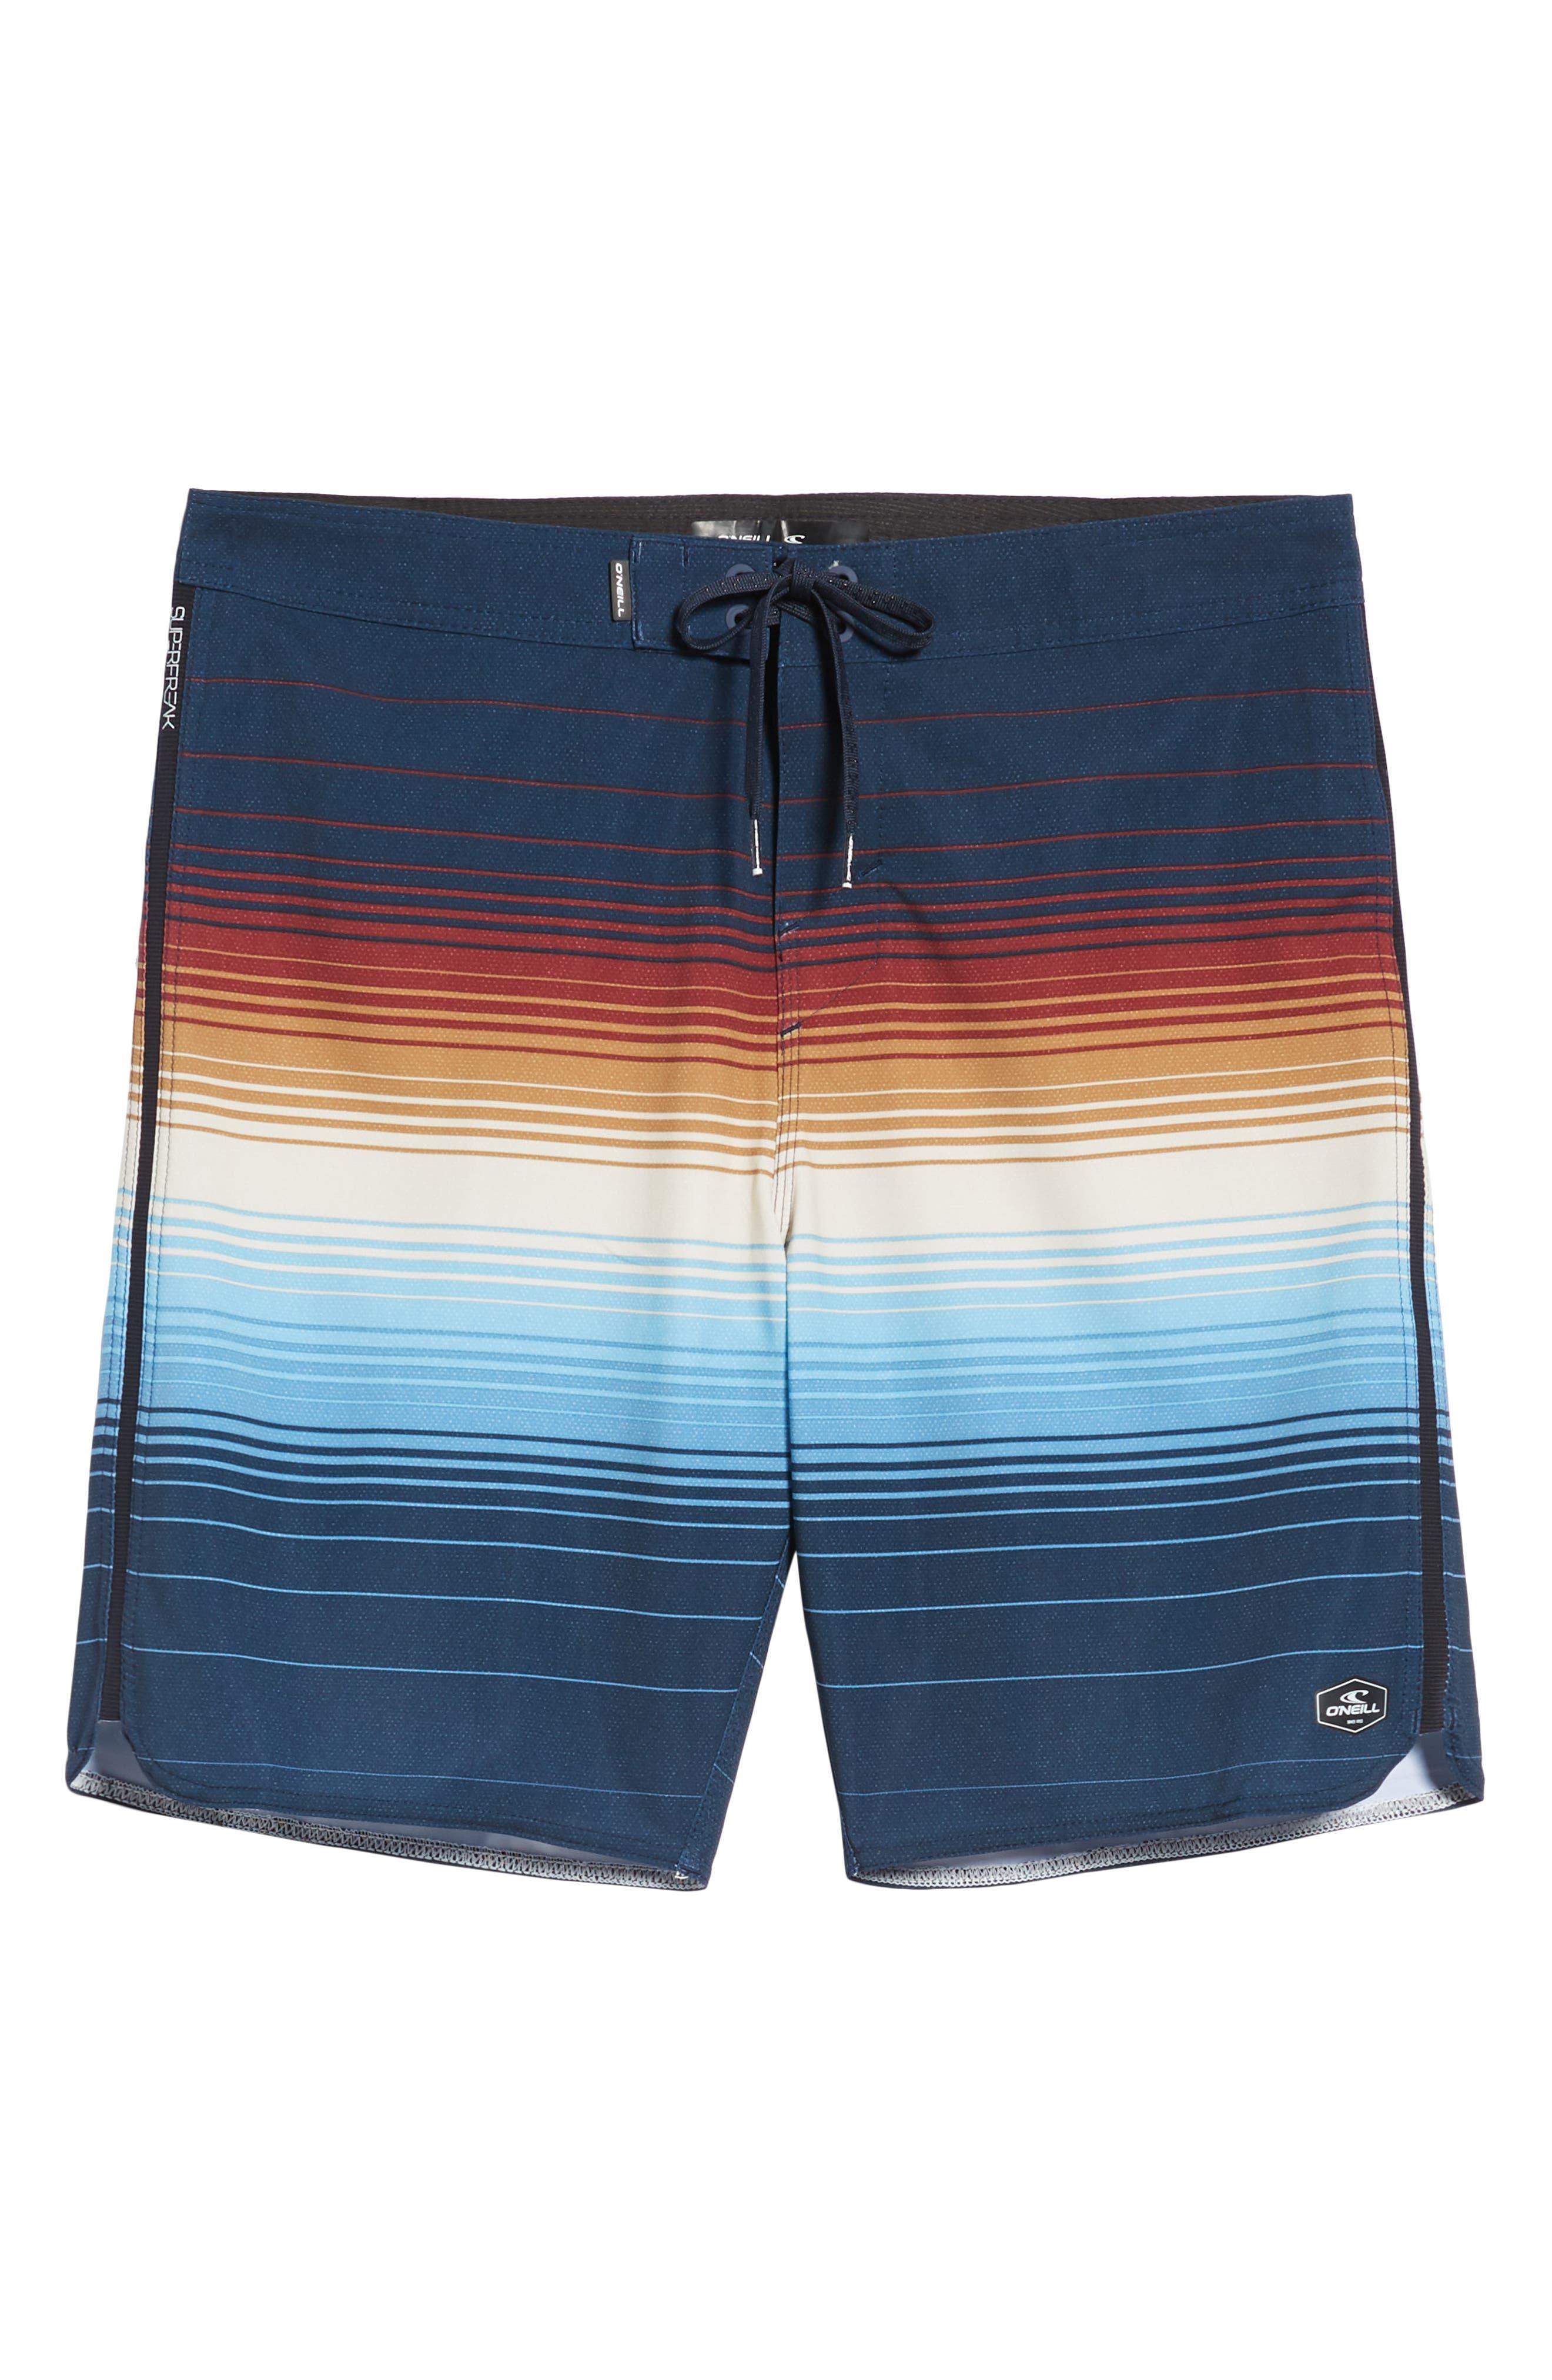 Superfreak Villa Board Shorts,                             Alternate thumbnail 6, color,                             NAVY